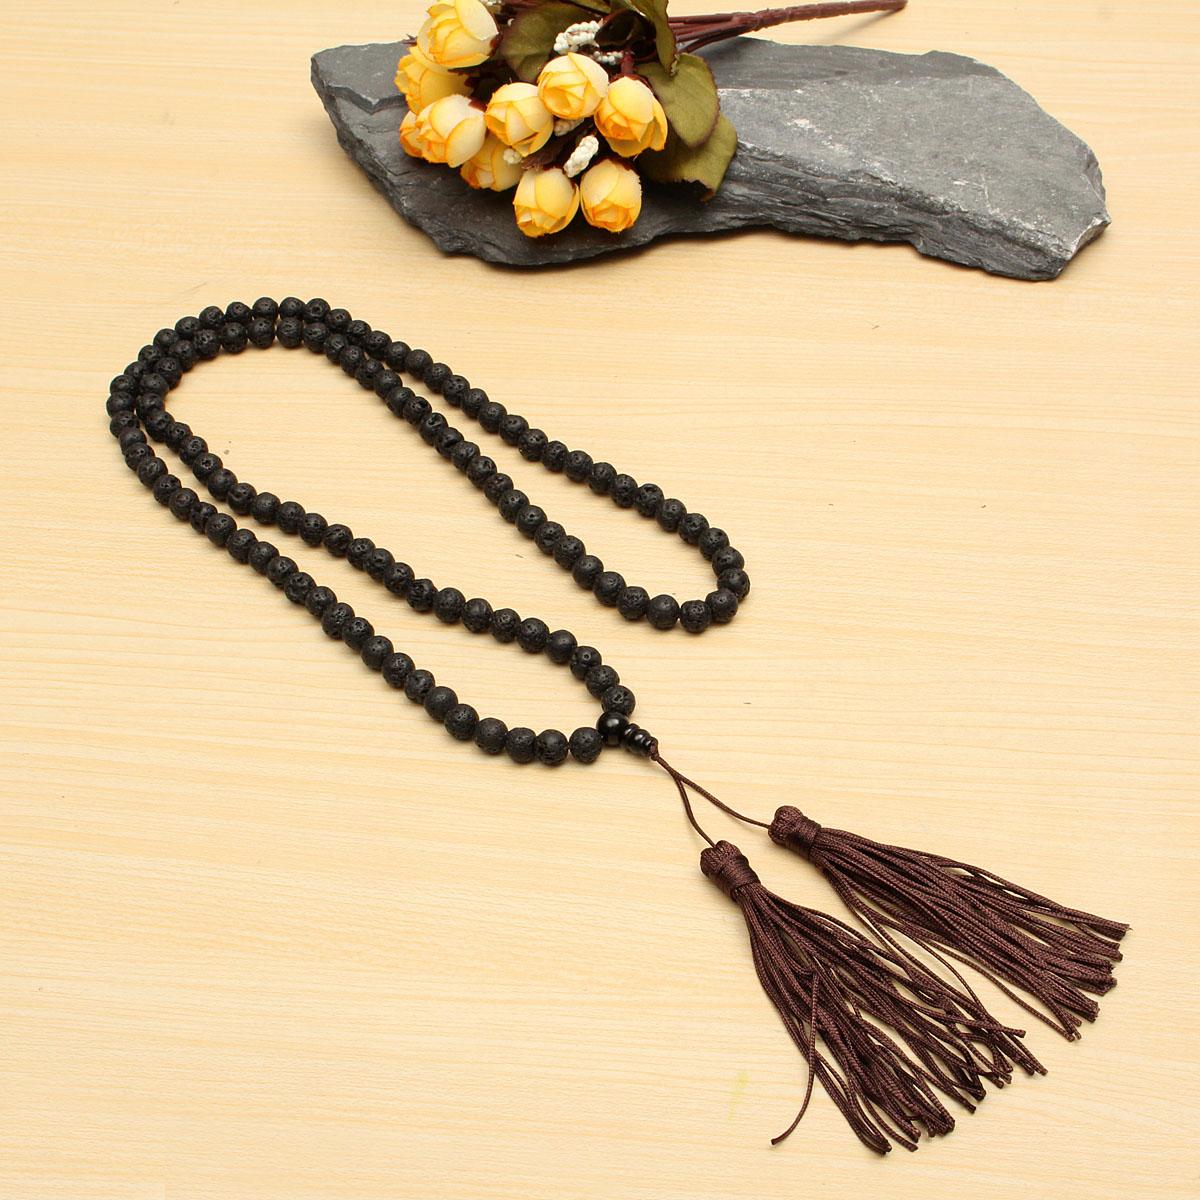 8mm Black Round Volcano Stone Beads Buddhist Necklace Unisex